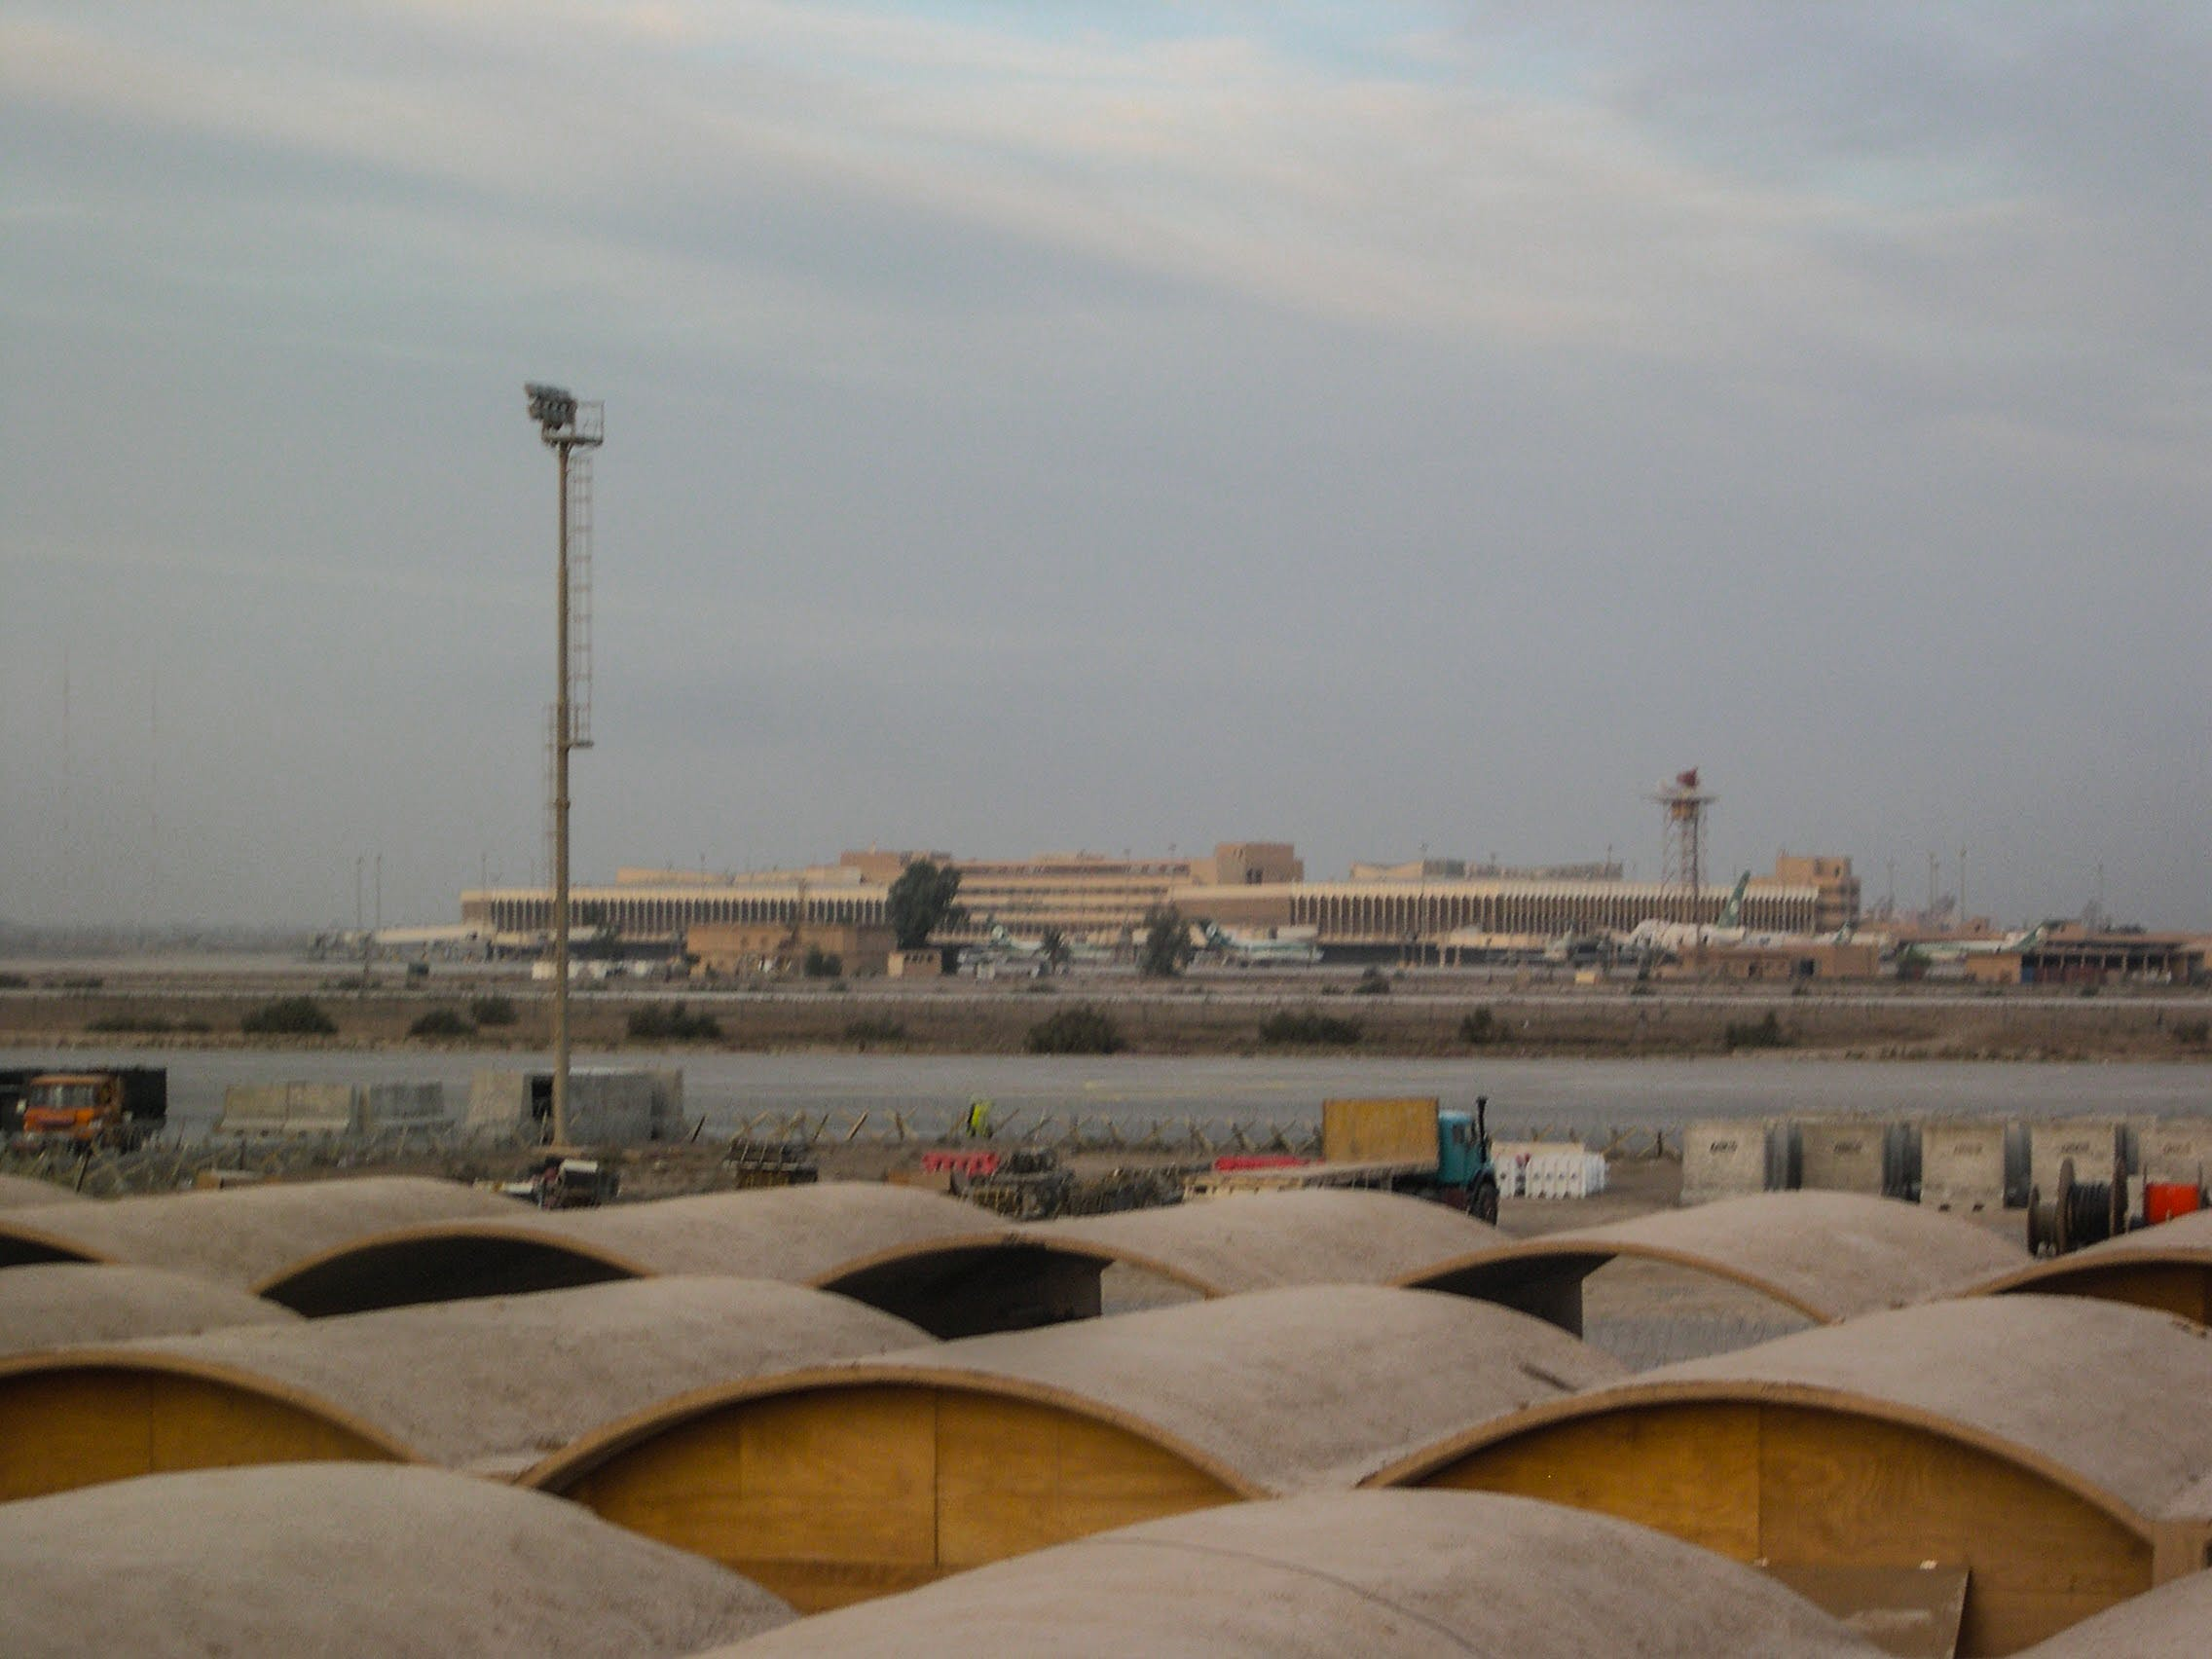 Free stock photo of airport, bahgdad international airport, military, runway